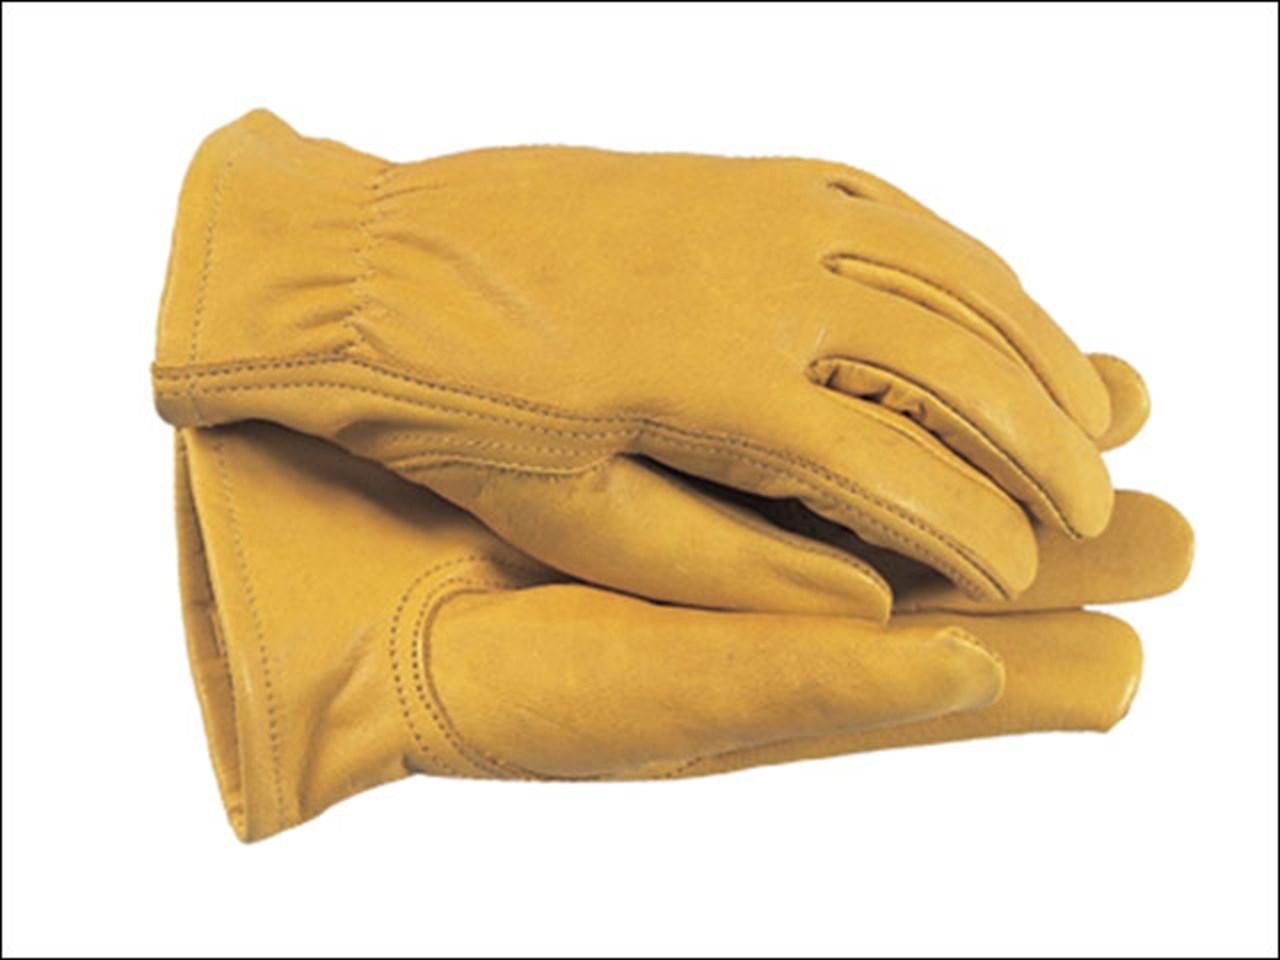 Town And Country Tgl105m Premium Leather Gloves Ladies Medium